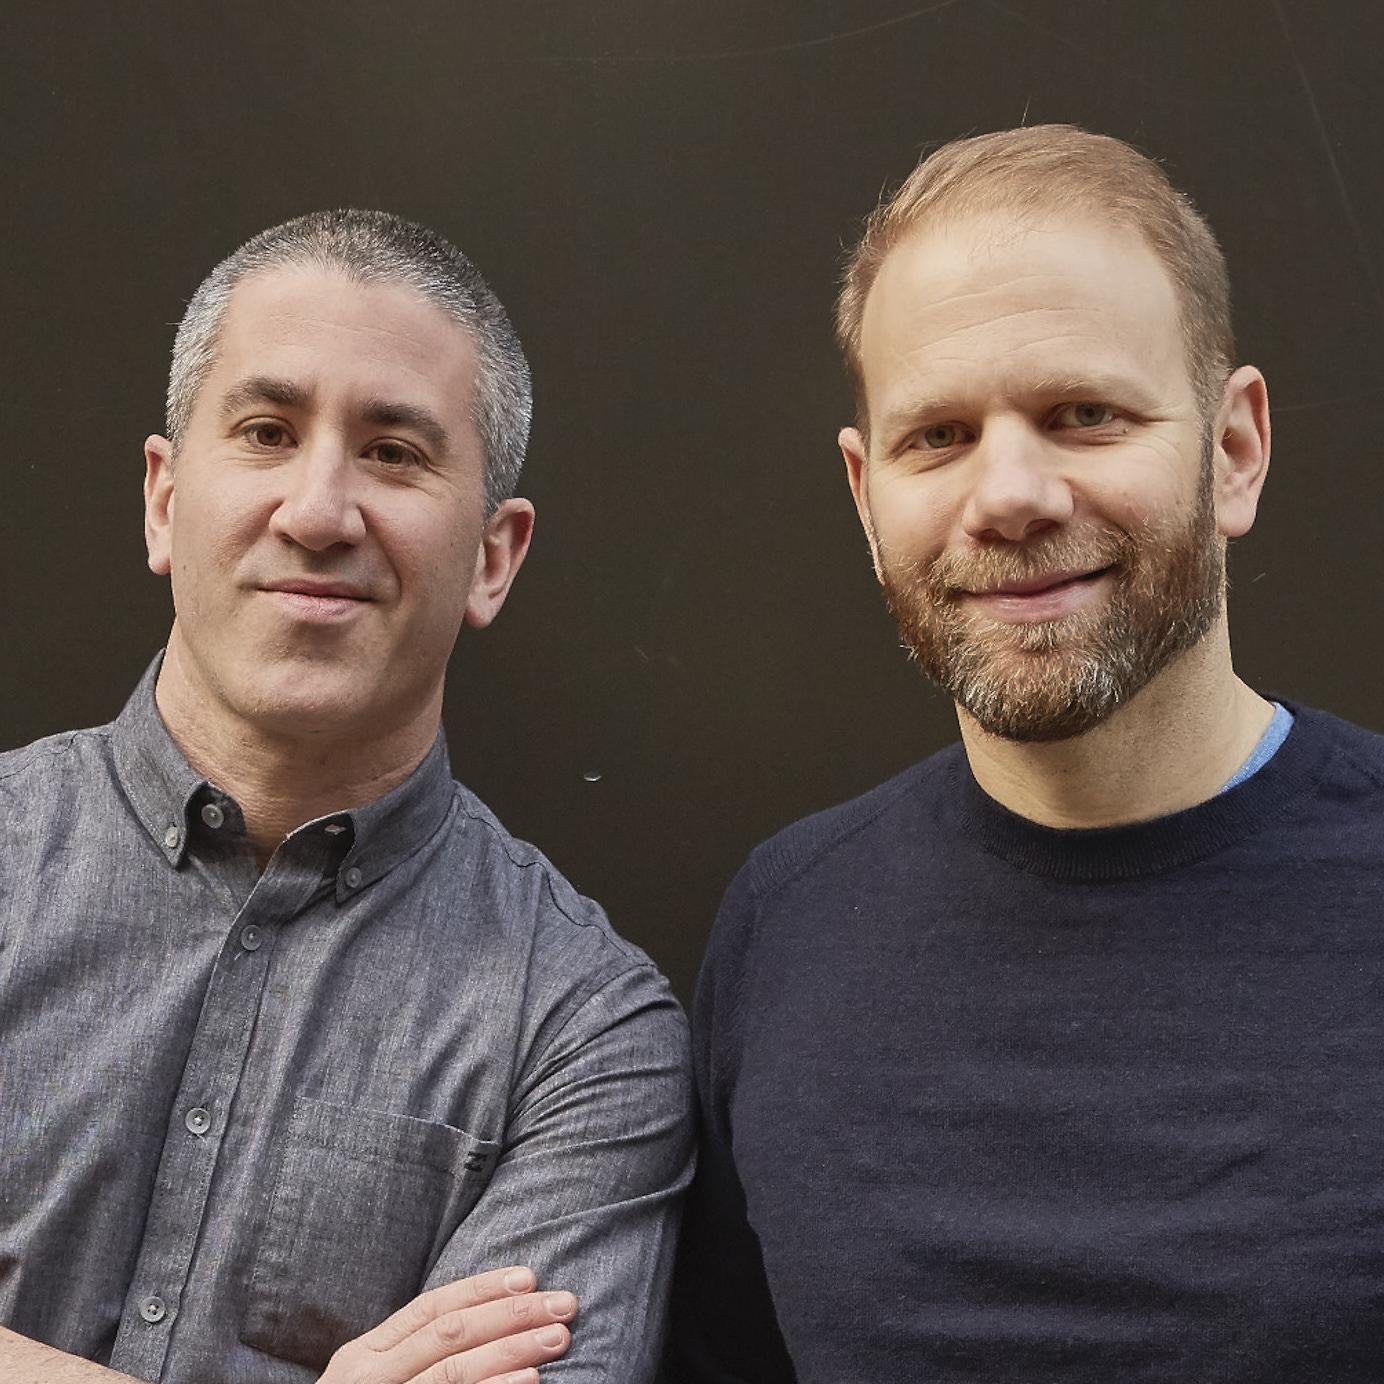 Michael Solomonov & Steve Cook